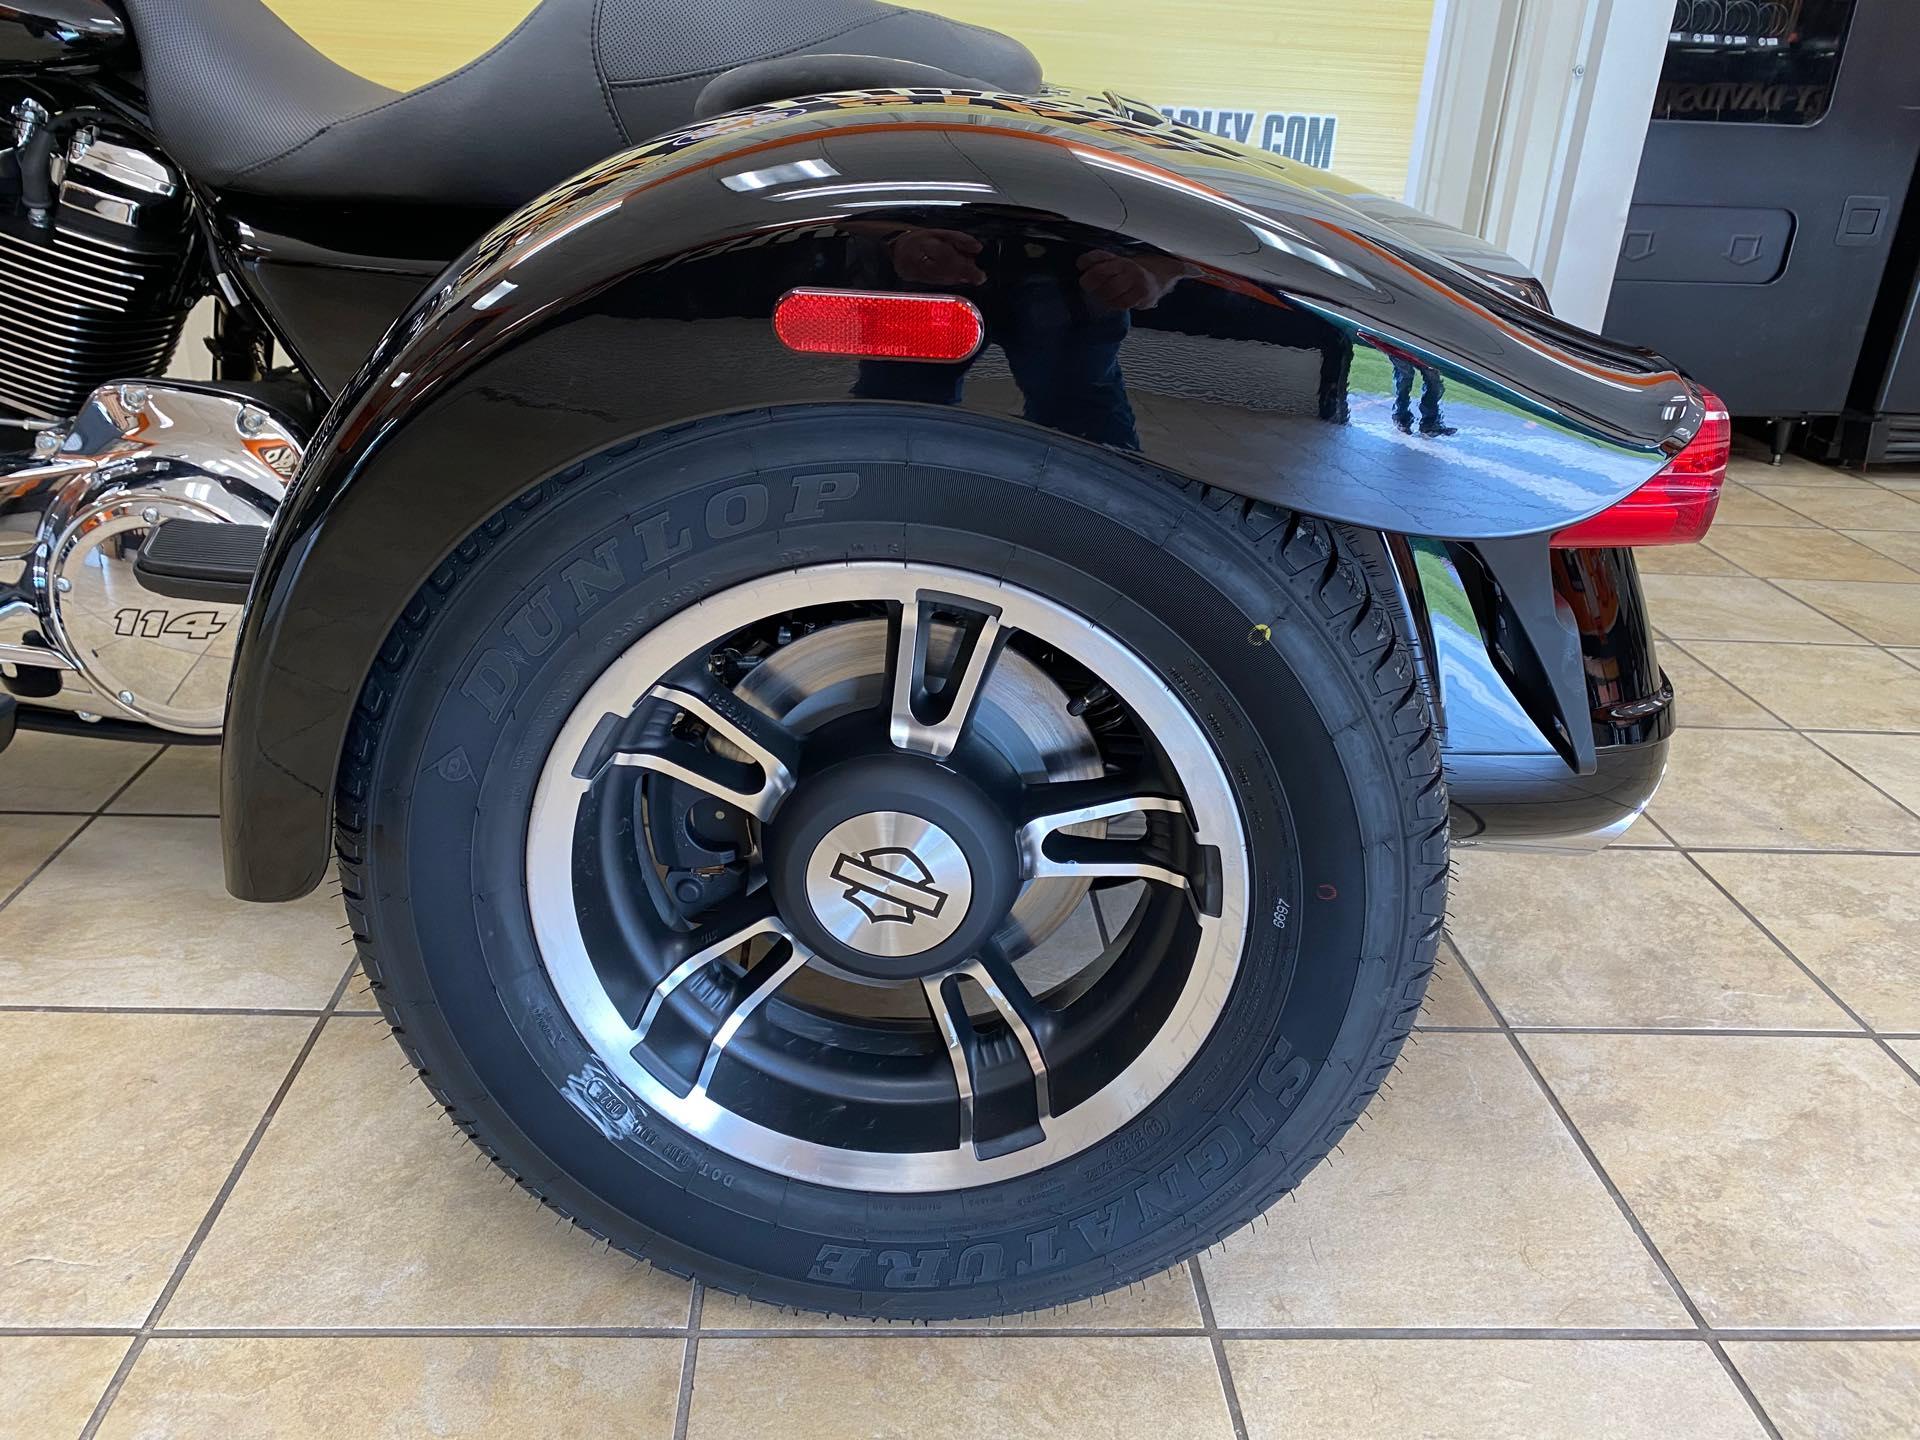 2021 Harley-Davidson Trike Freewheeler at Gold Star Harley-Davidson